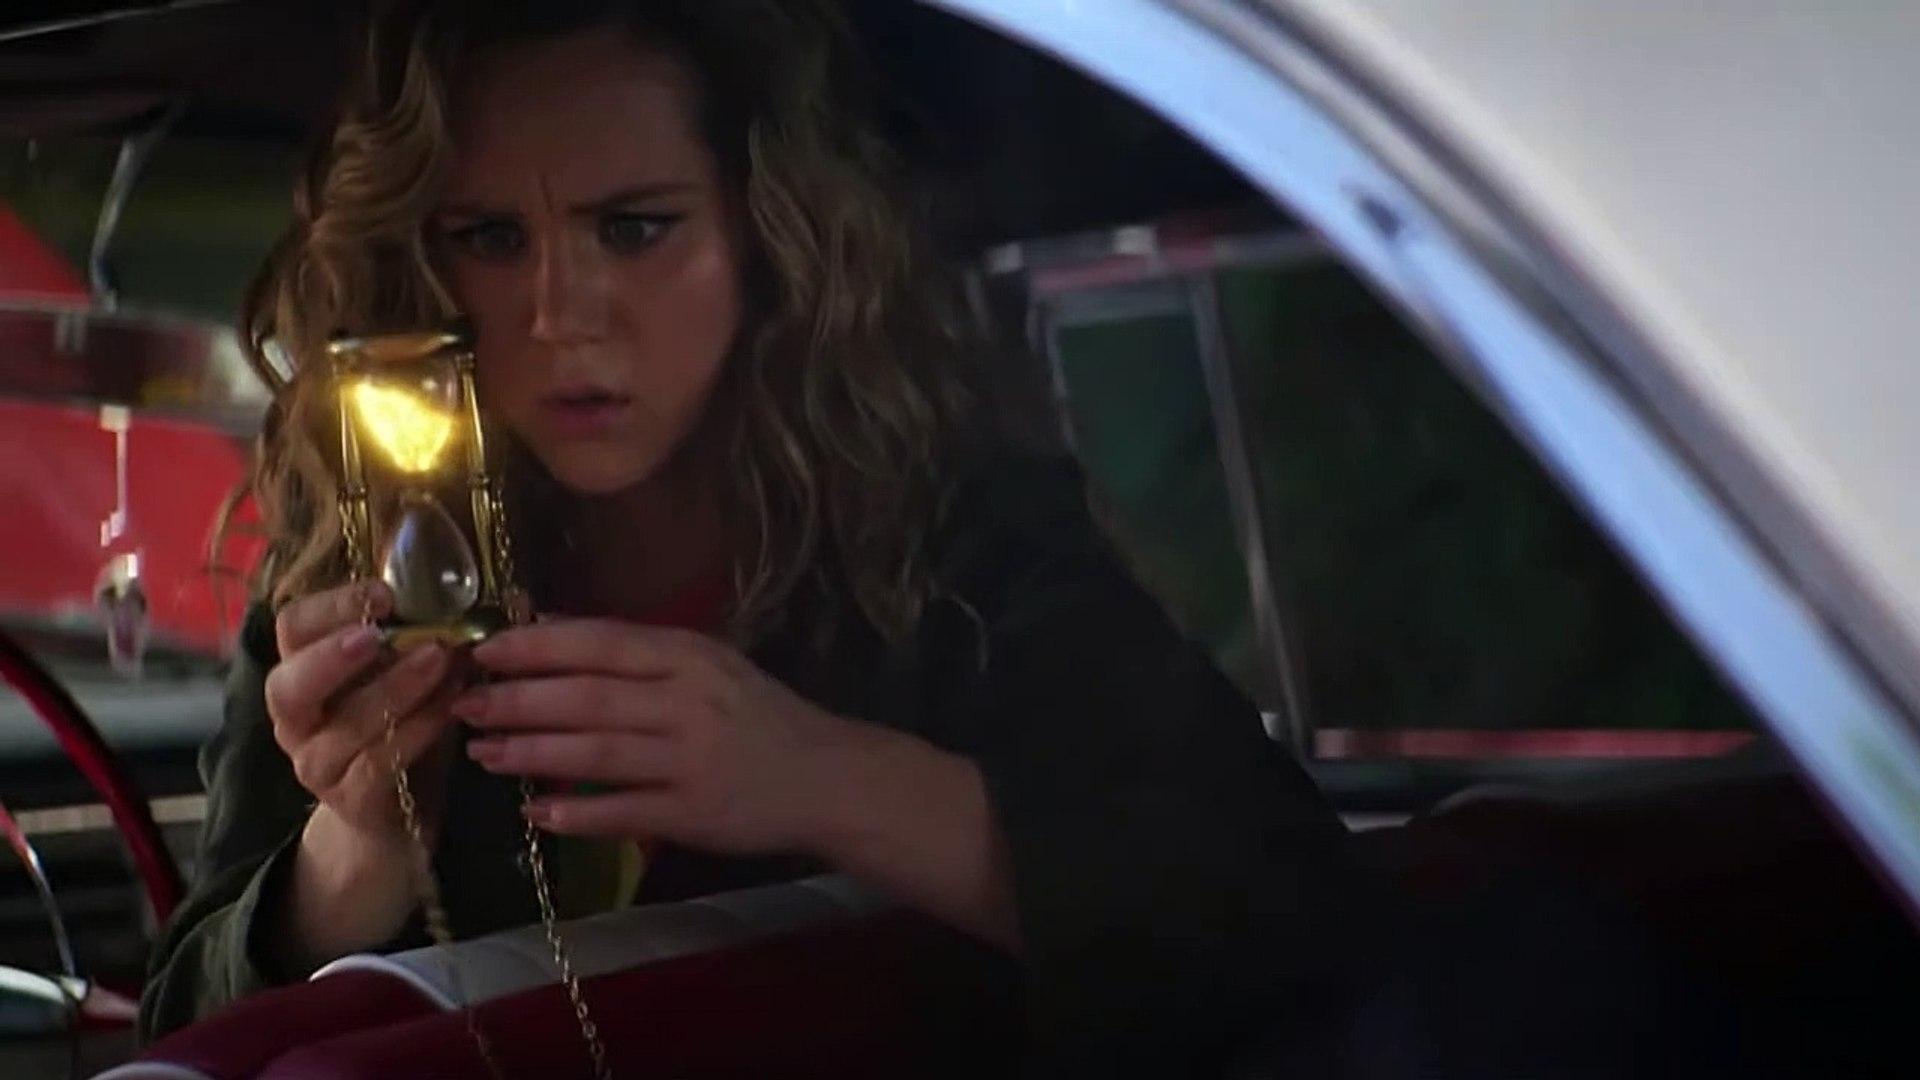 Stargirl S01E05 Hourman and Dr. Mid-Nite